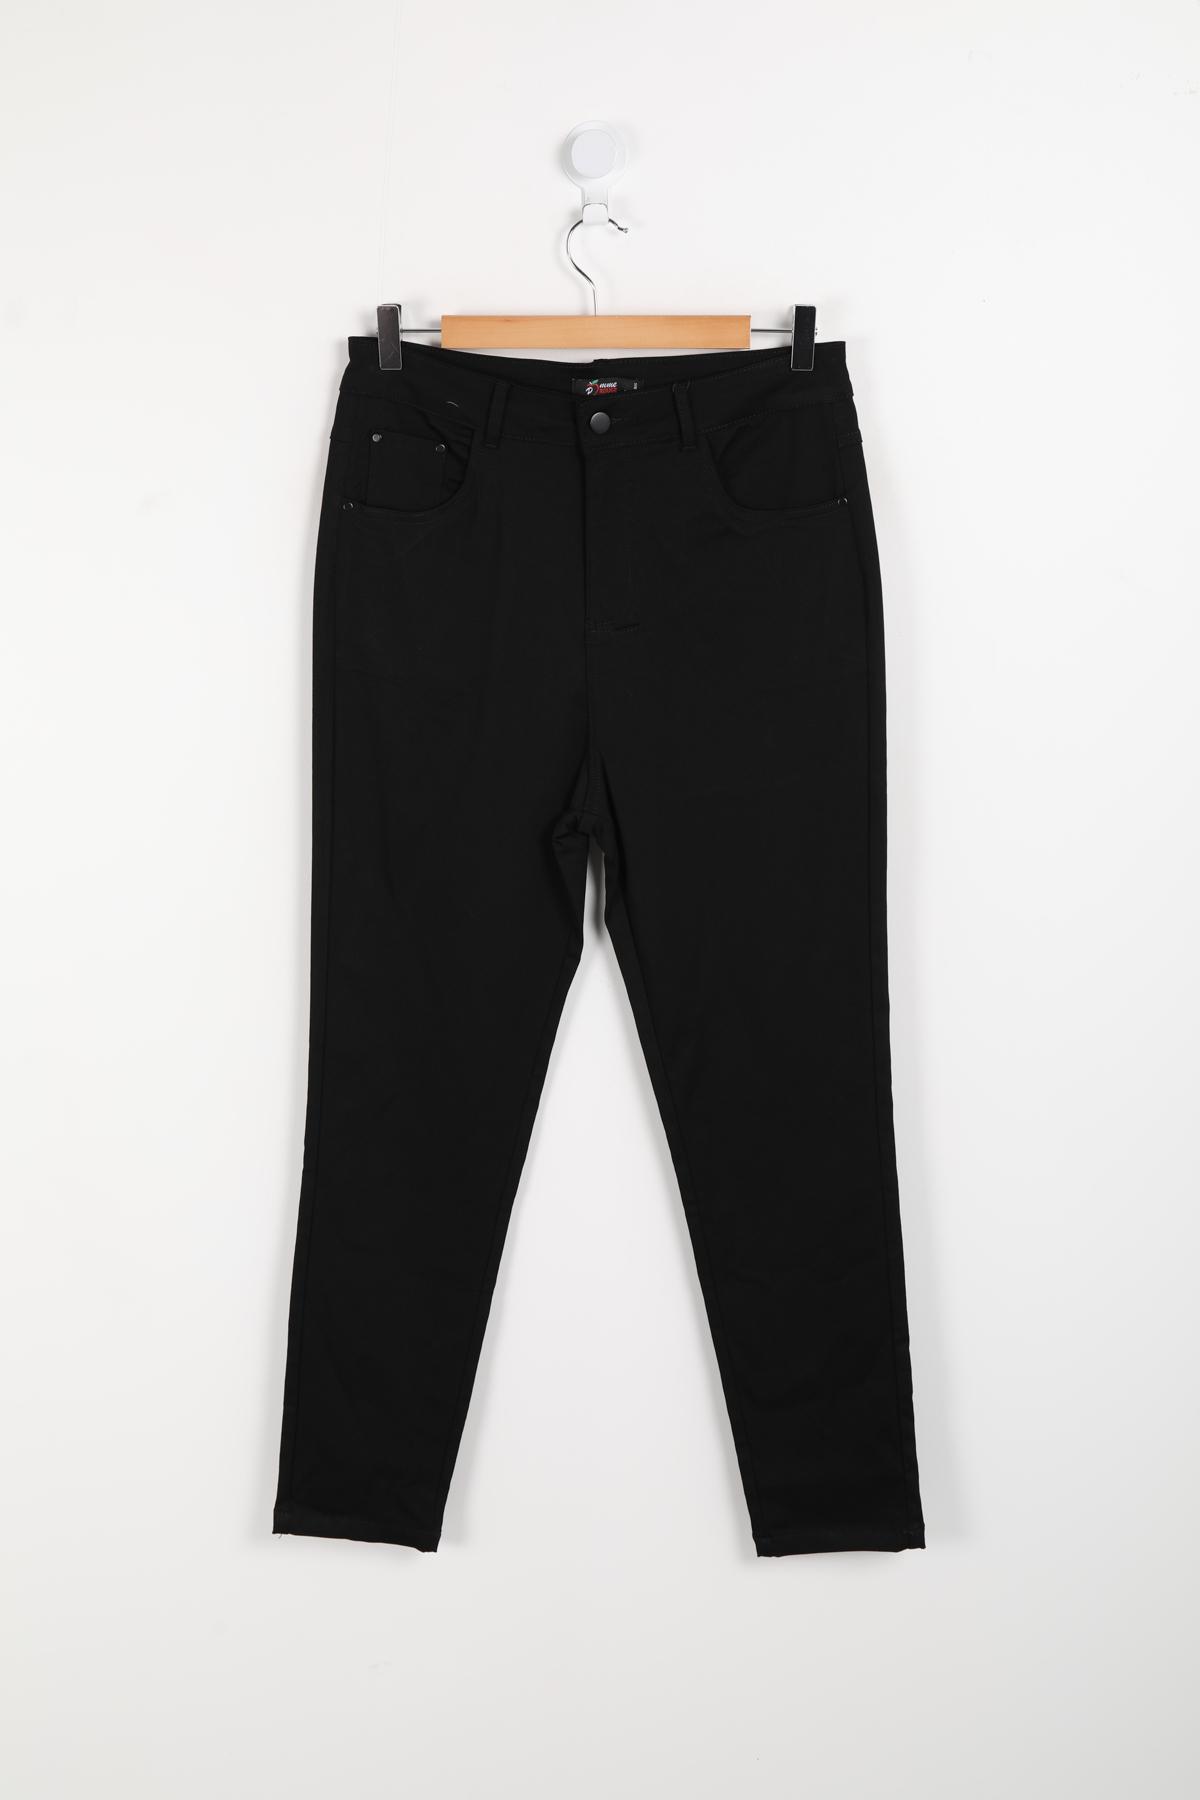 pantalon grande taille femme pomme rouge b302 noir 42-56